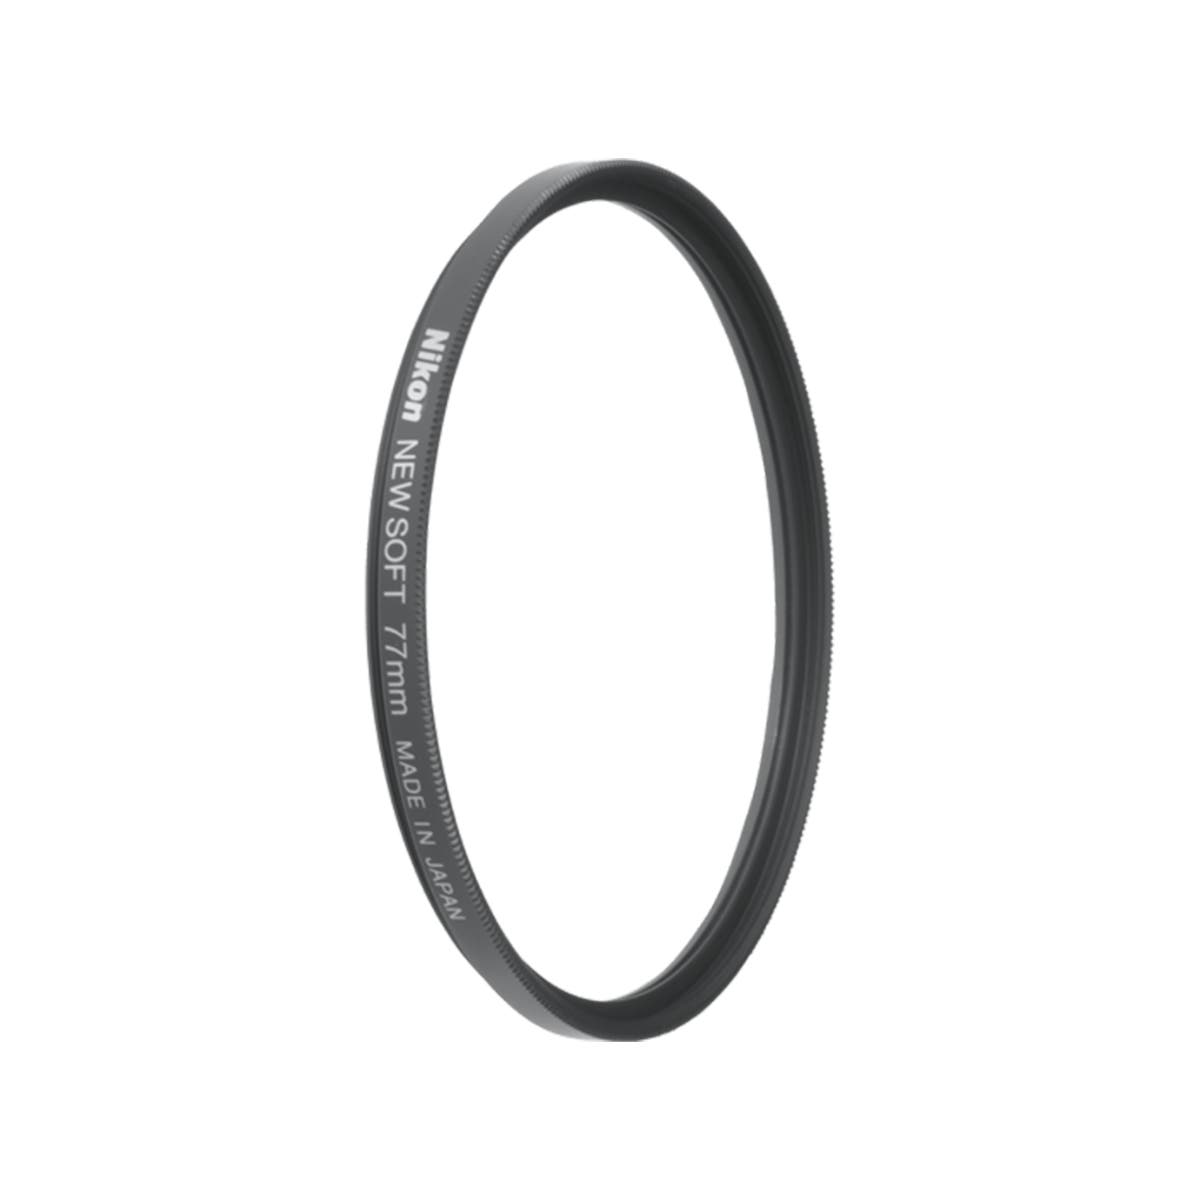 77mm Soft Focus Filter